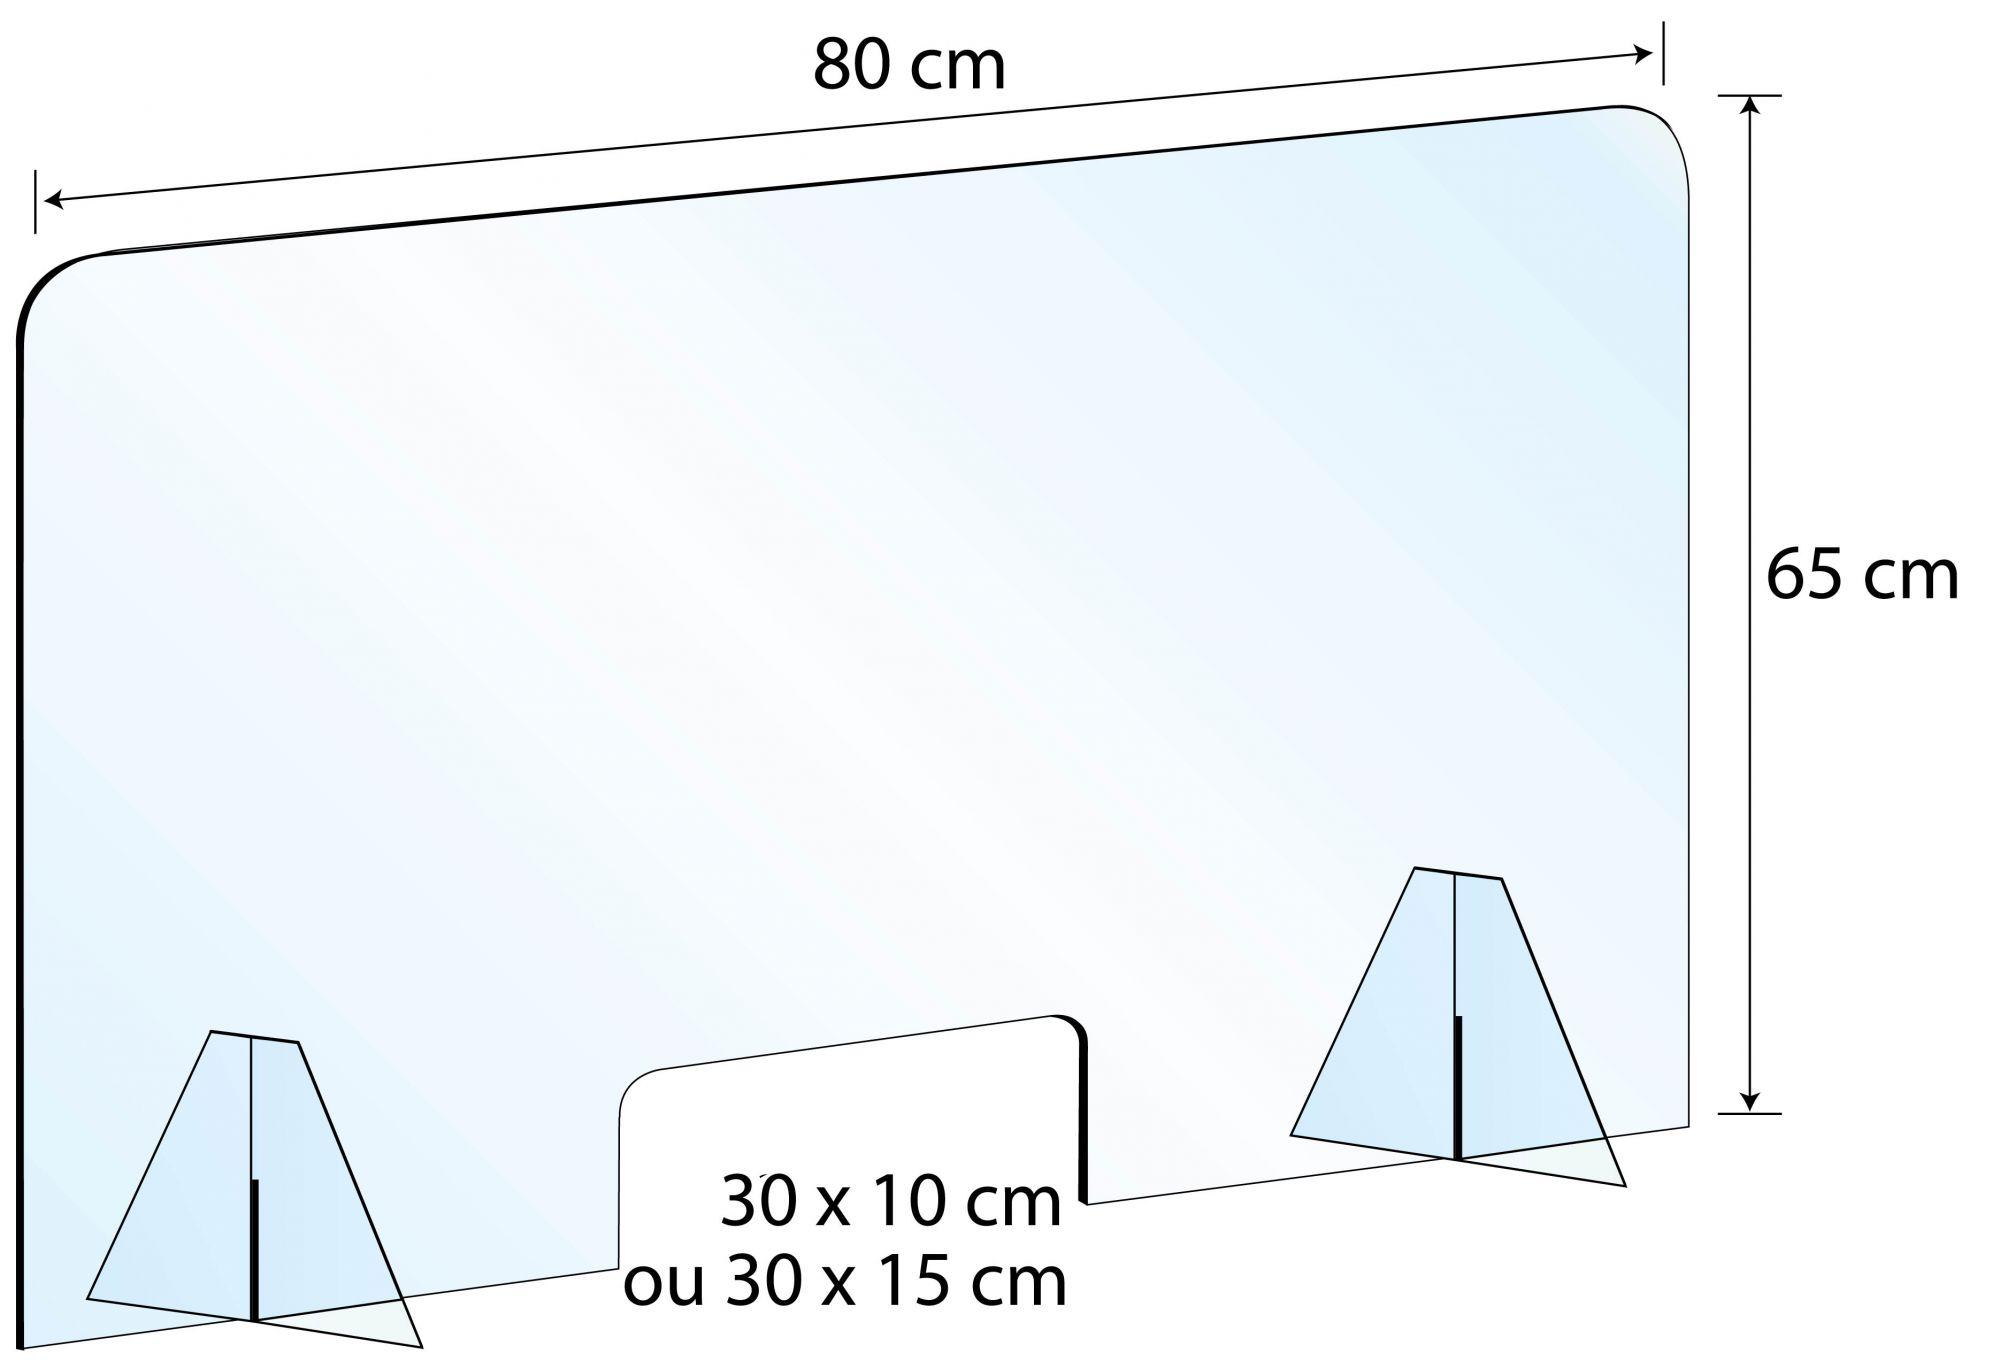 Ecran de protection hygiaphone plexiglas